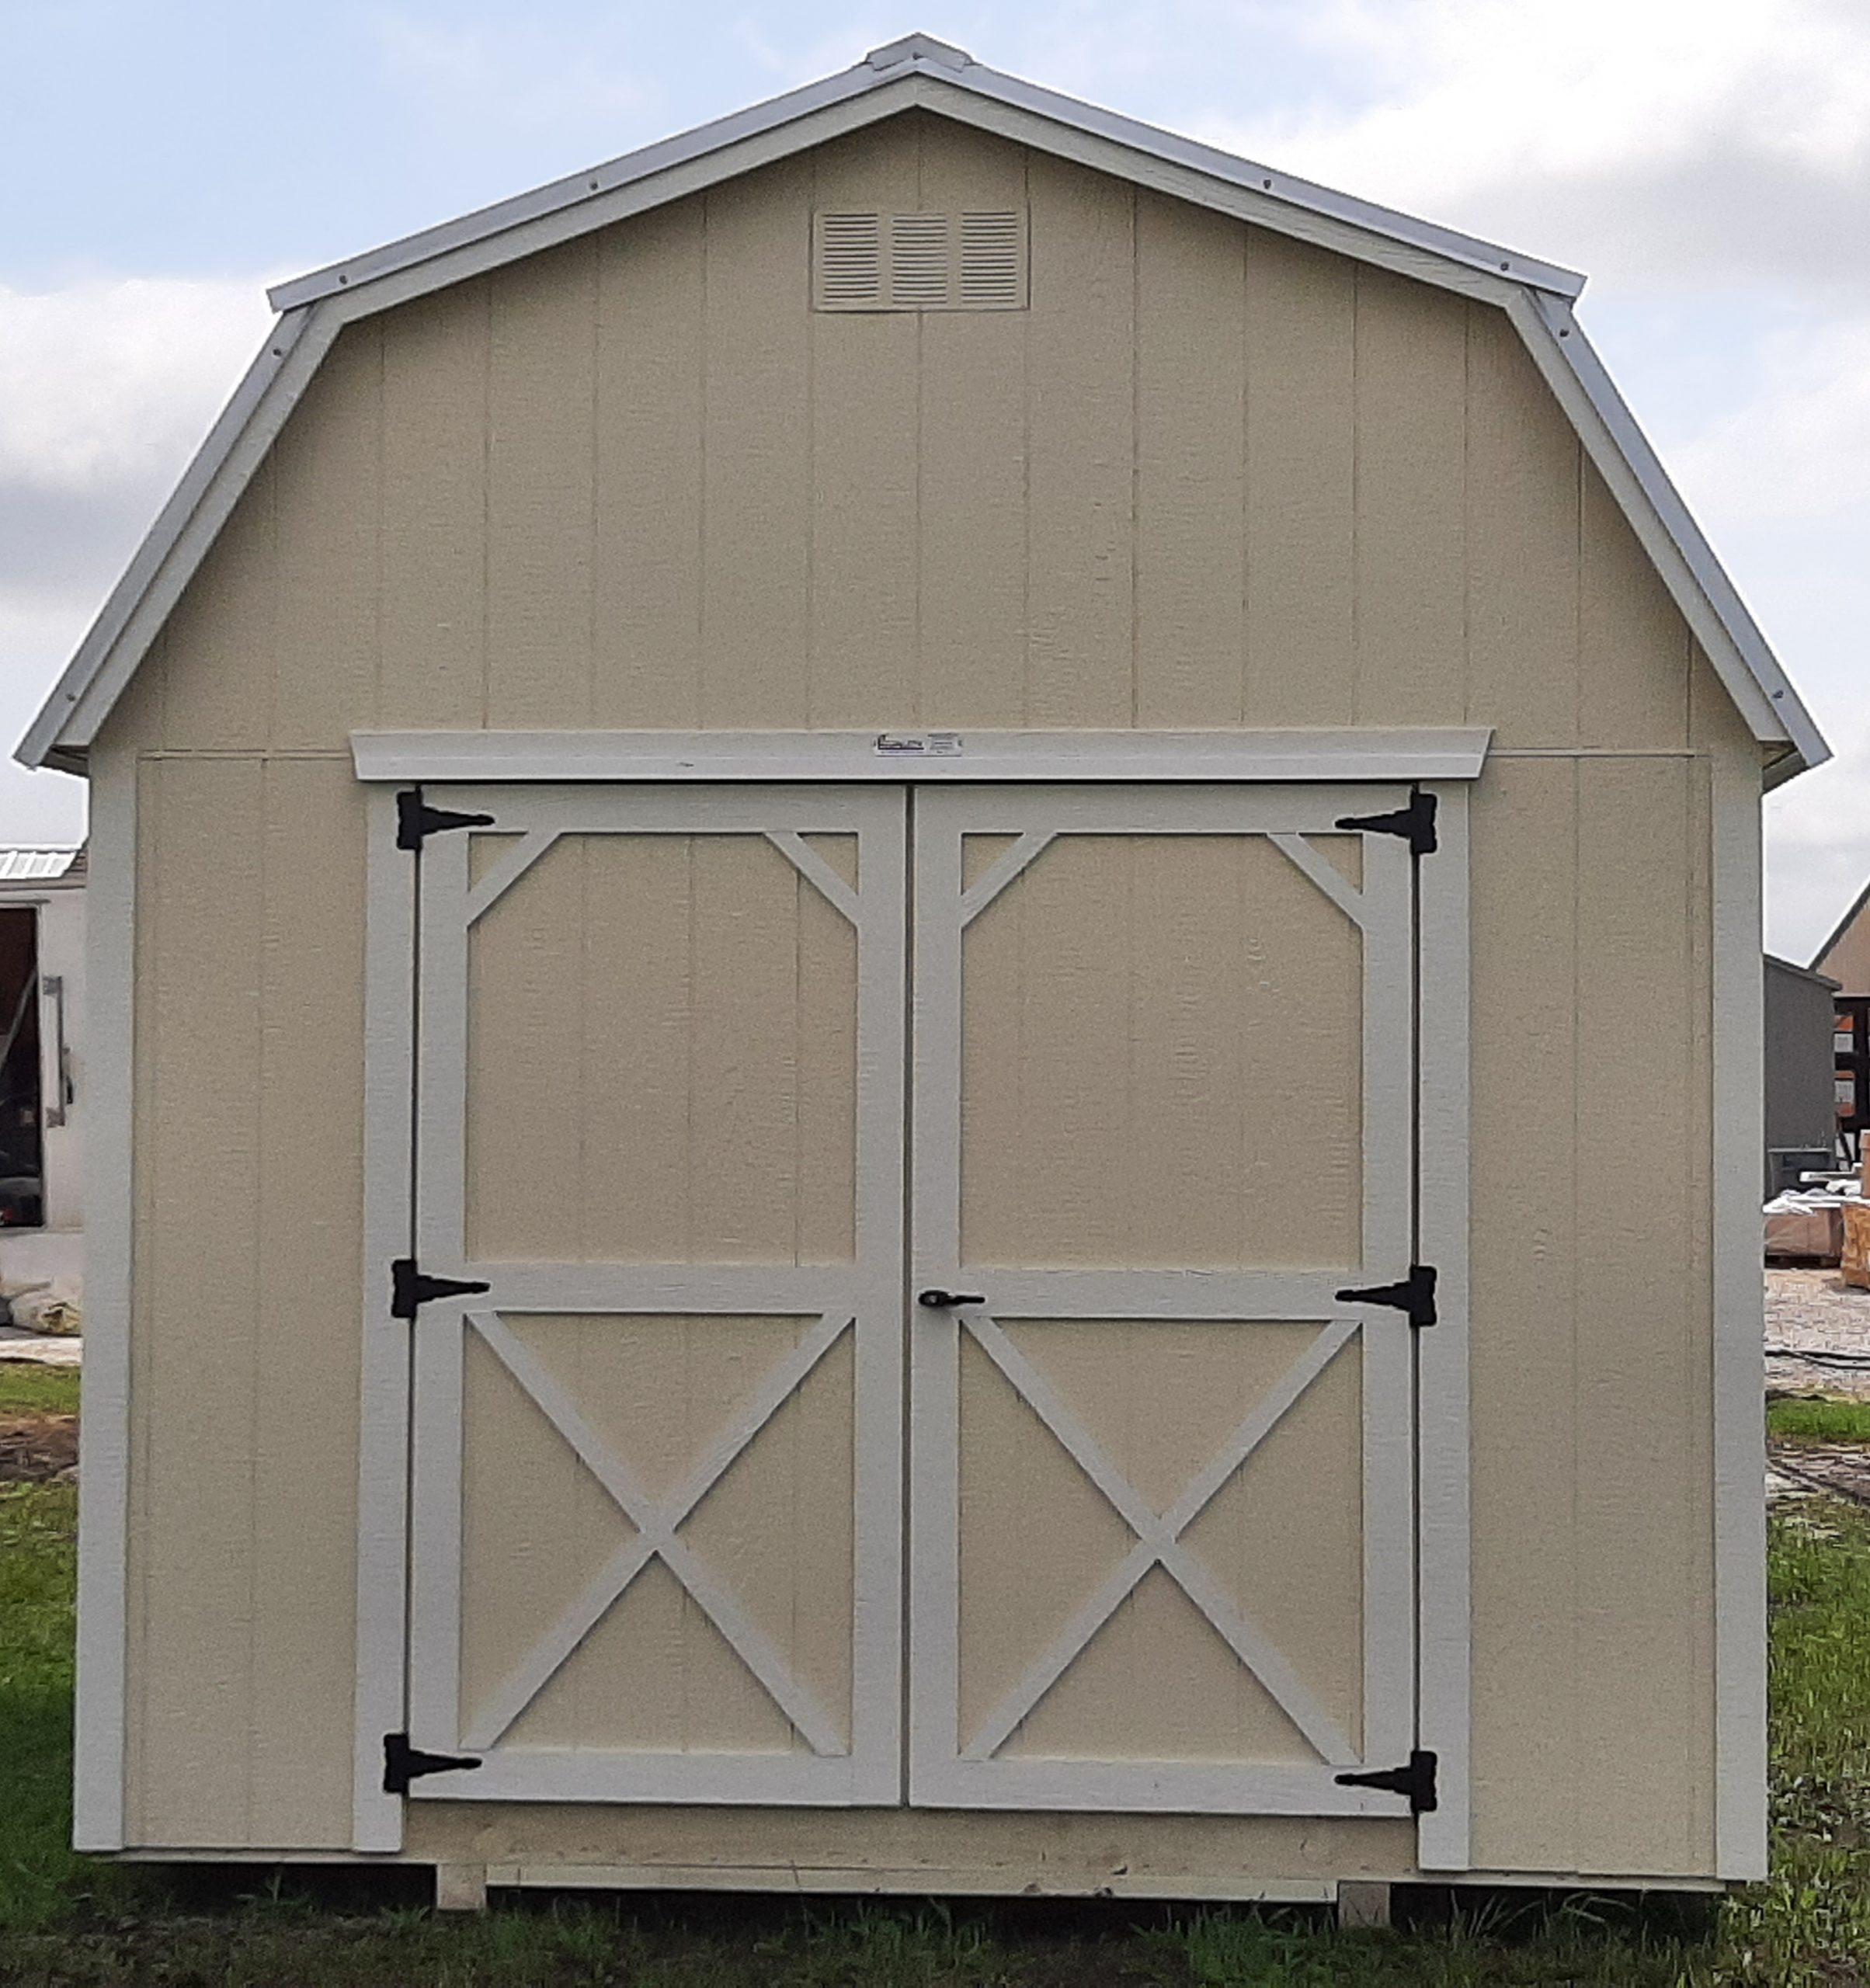 10x12 Elite Lofted Barn #1977 Image